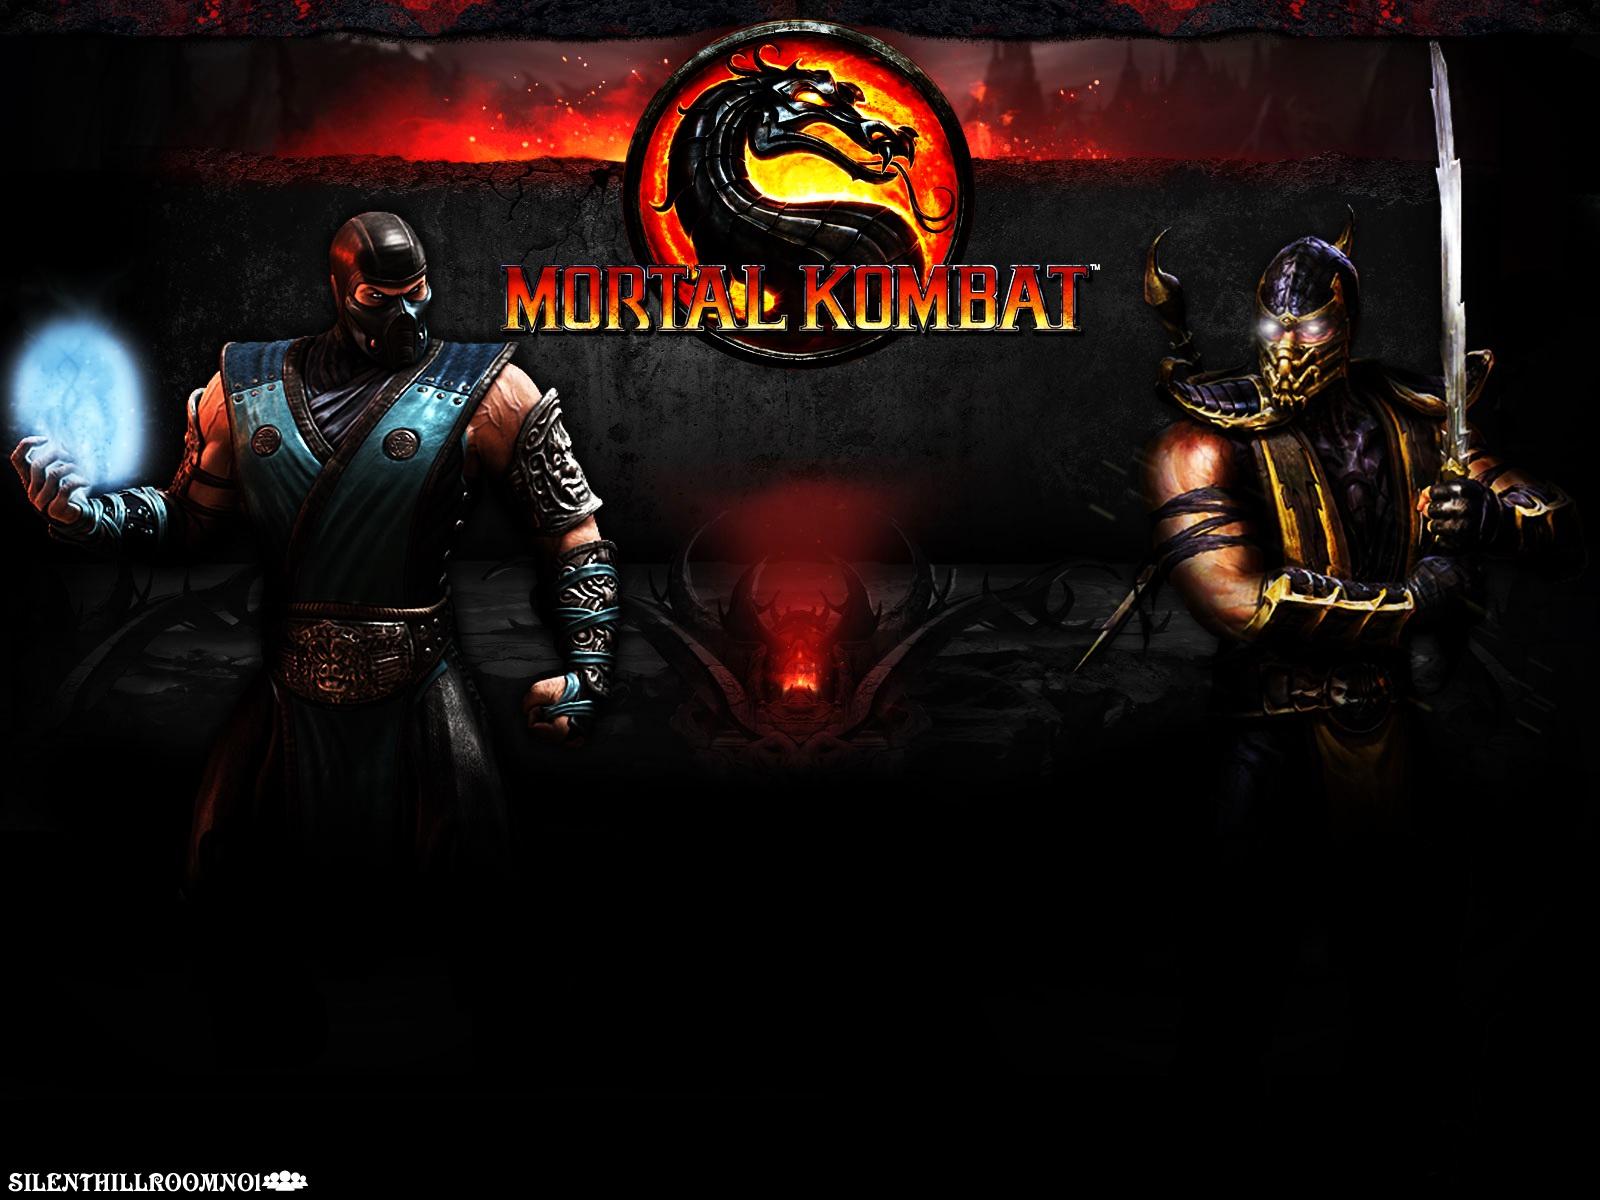 Scorpion VS Subzero Mortal Kombat 9 Wallpaper 1600x1200